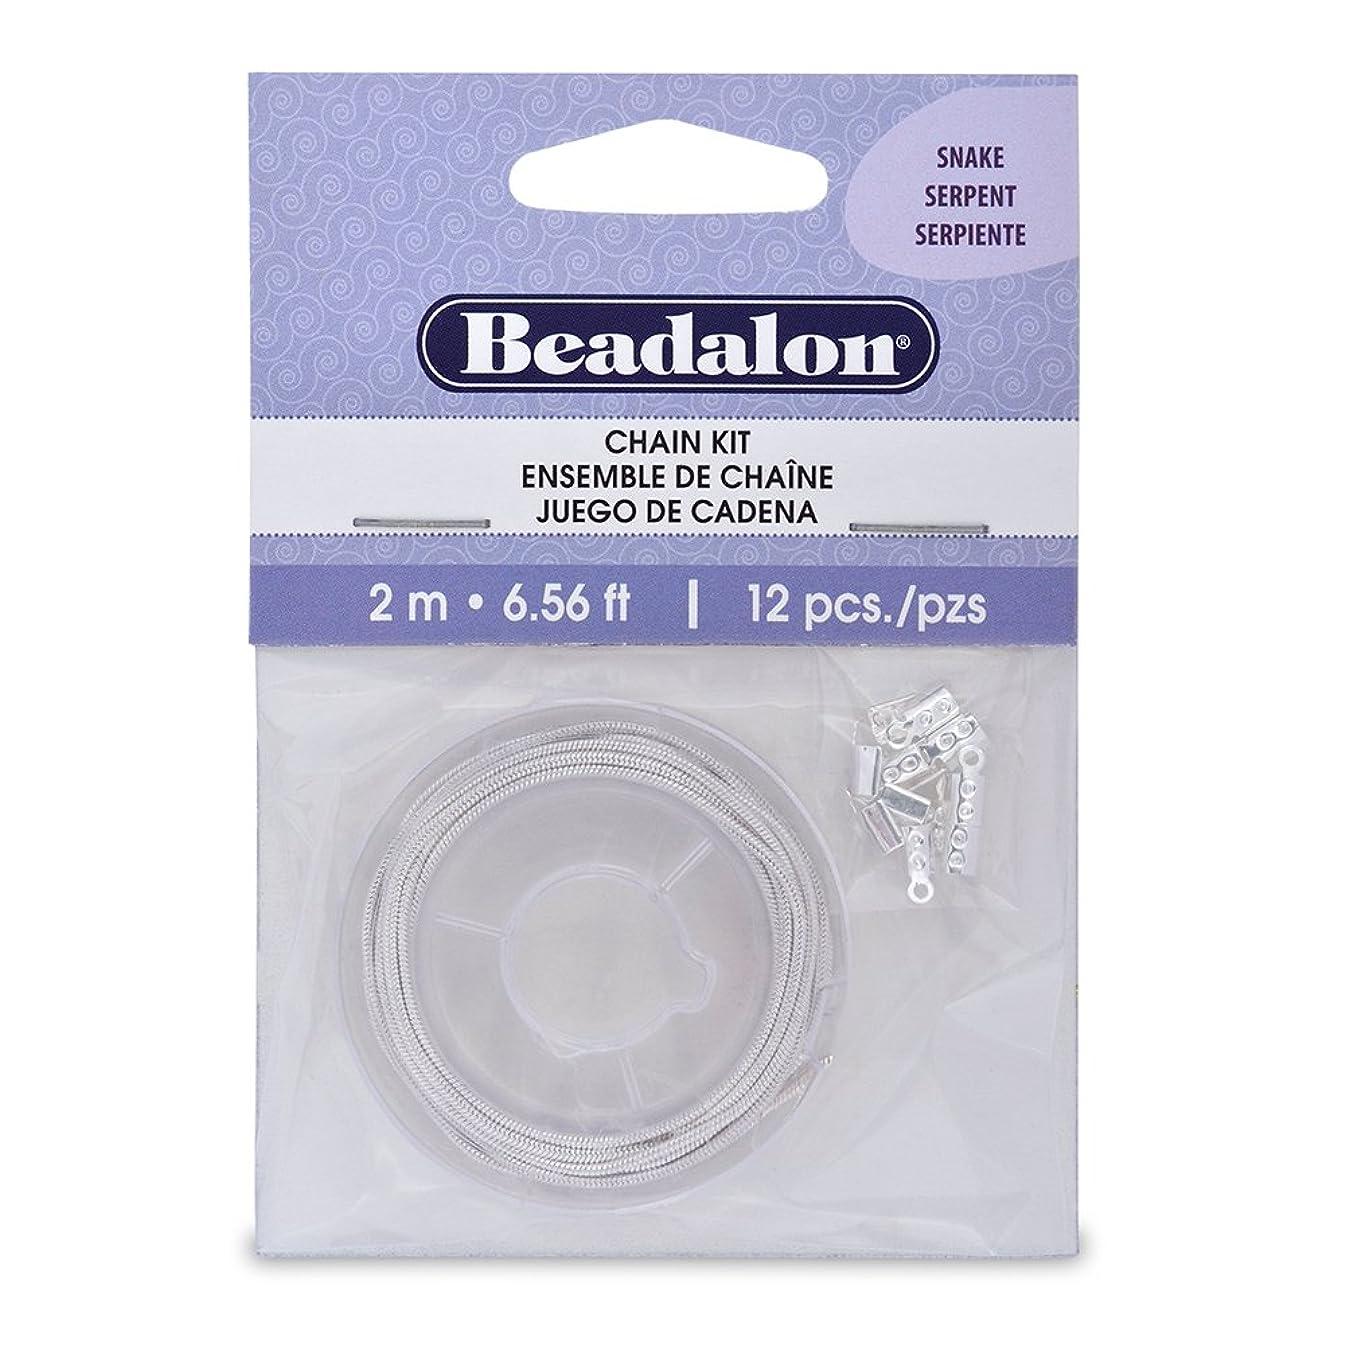 Beadalon Chain Kit 1-1/2mm Snake Silver Plated, 2-Meters